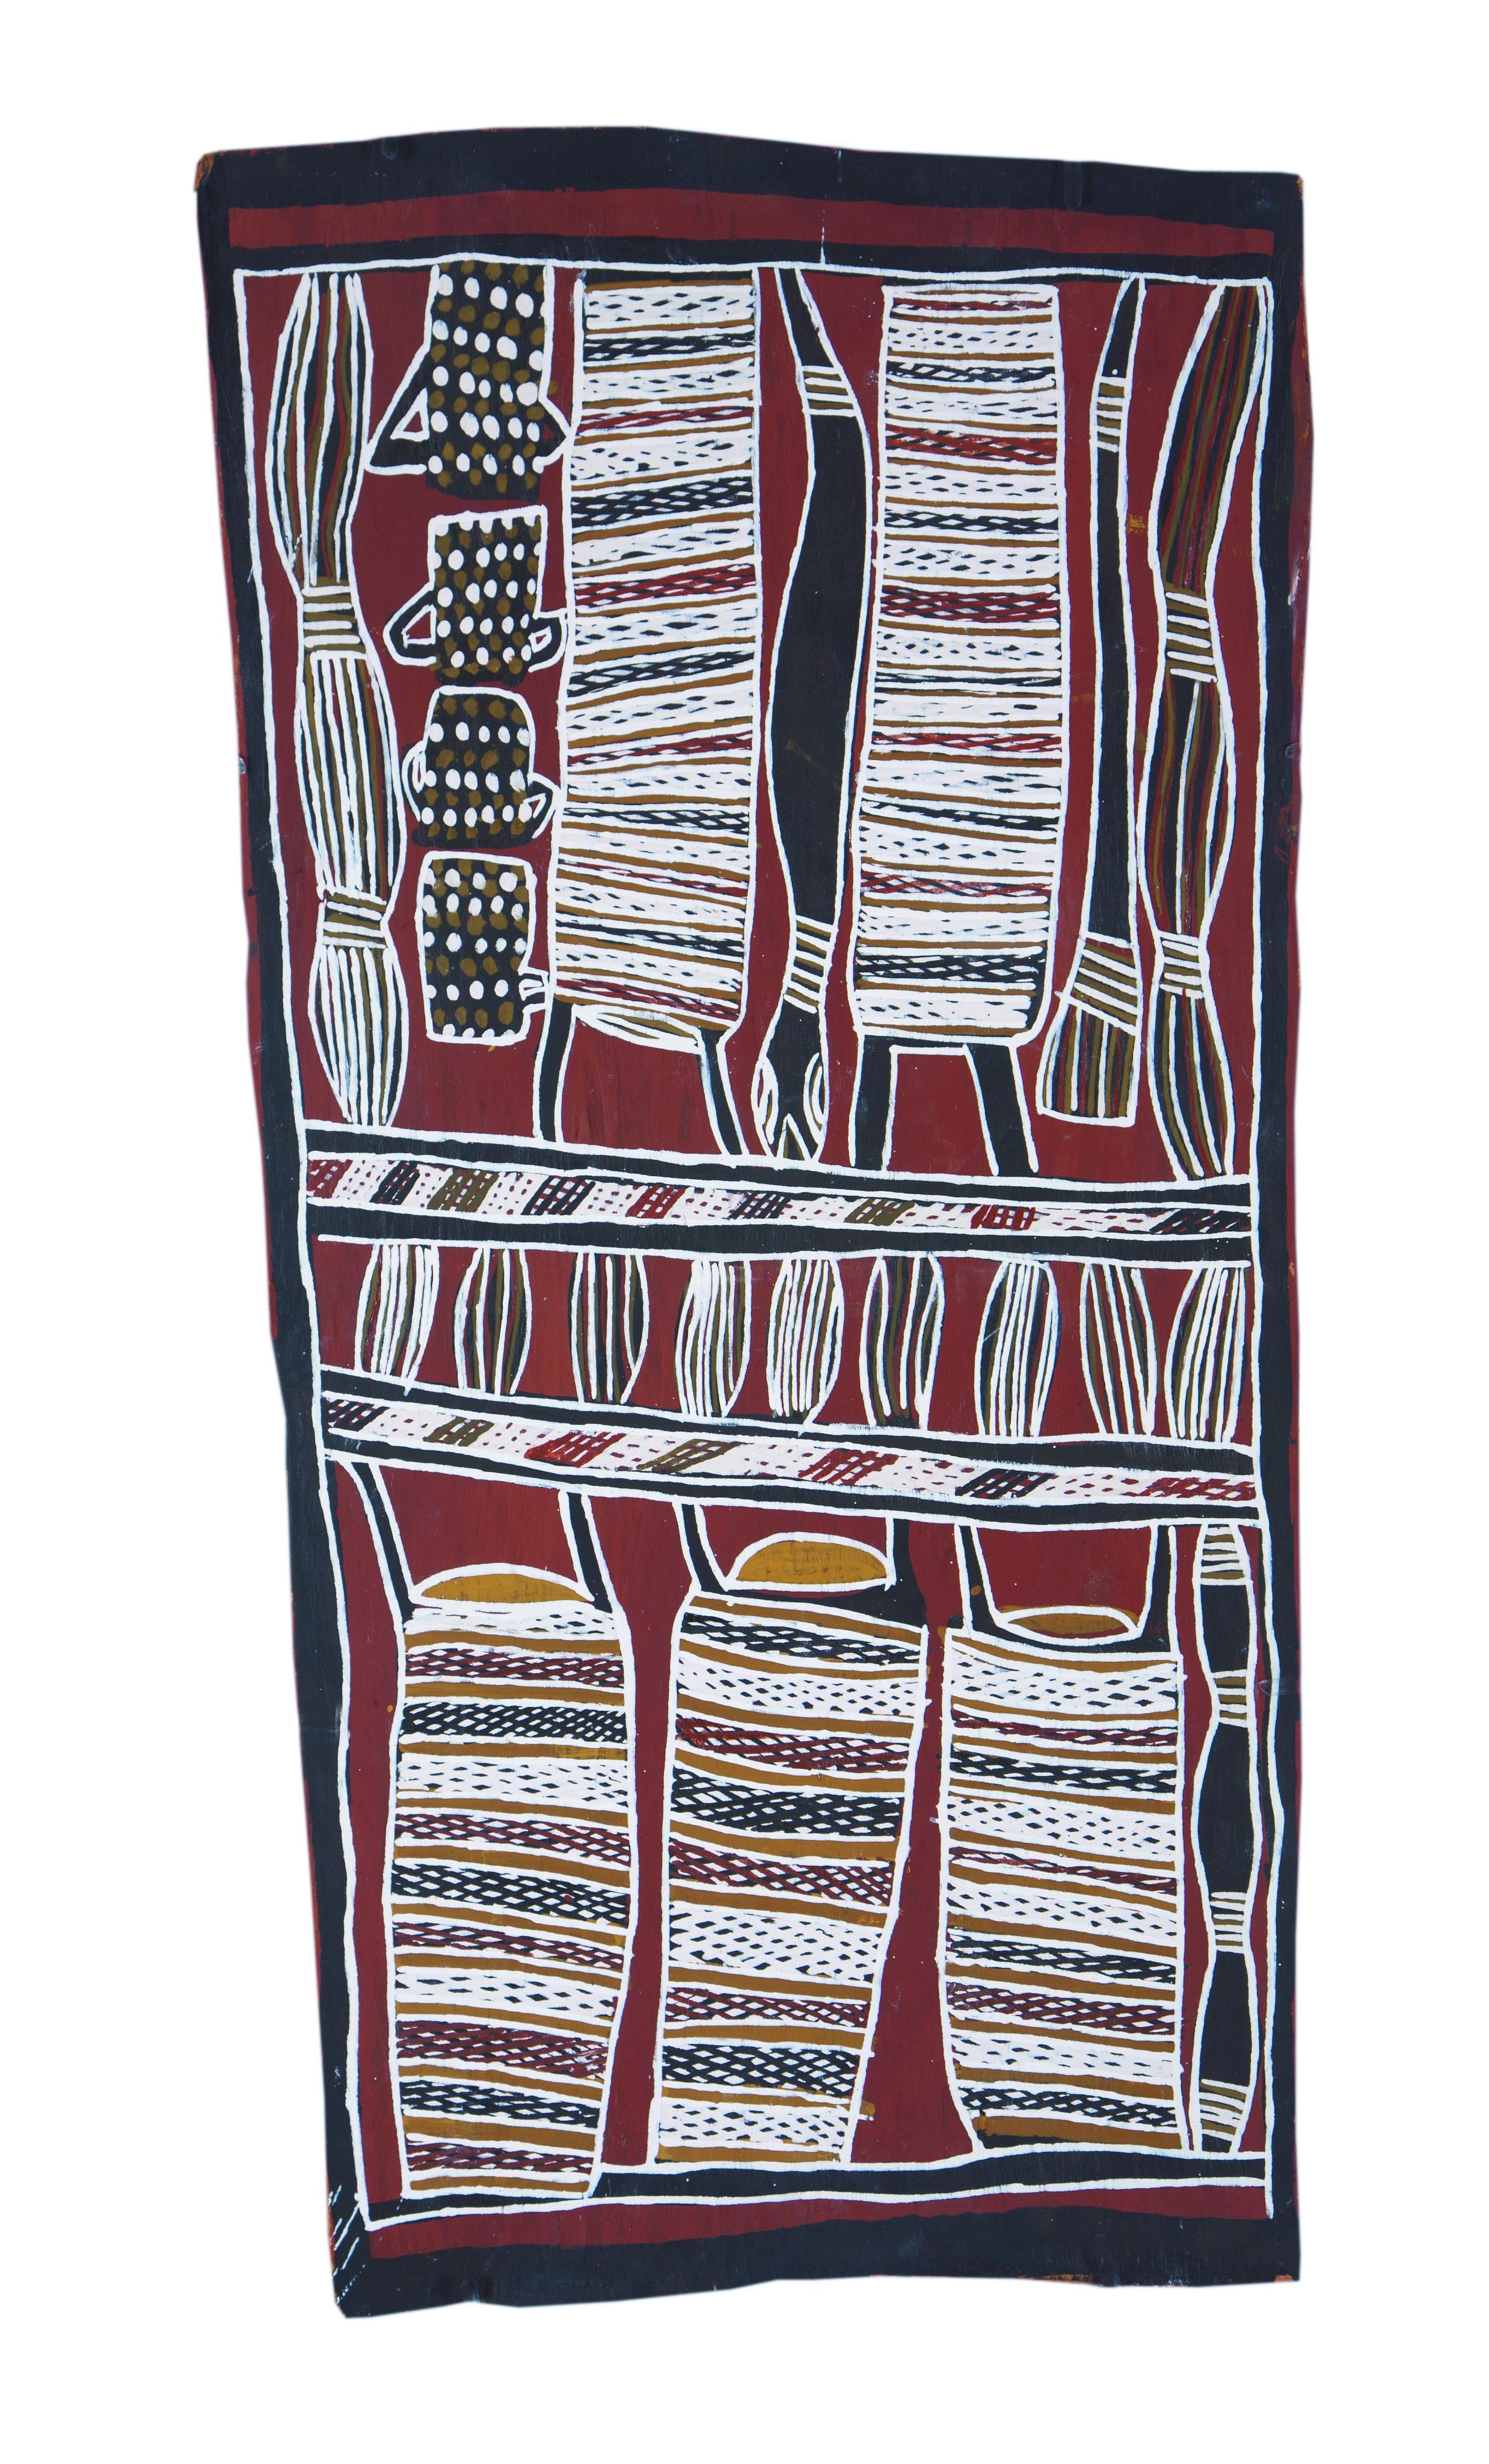 Nonggirrnga Marawili  Hunting  Natural earth pigments on bark 71 x 36cm  Buku Larrnggay Mulka #4049A   EMAIL INQUIRY